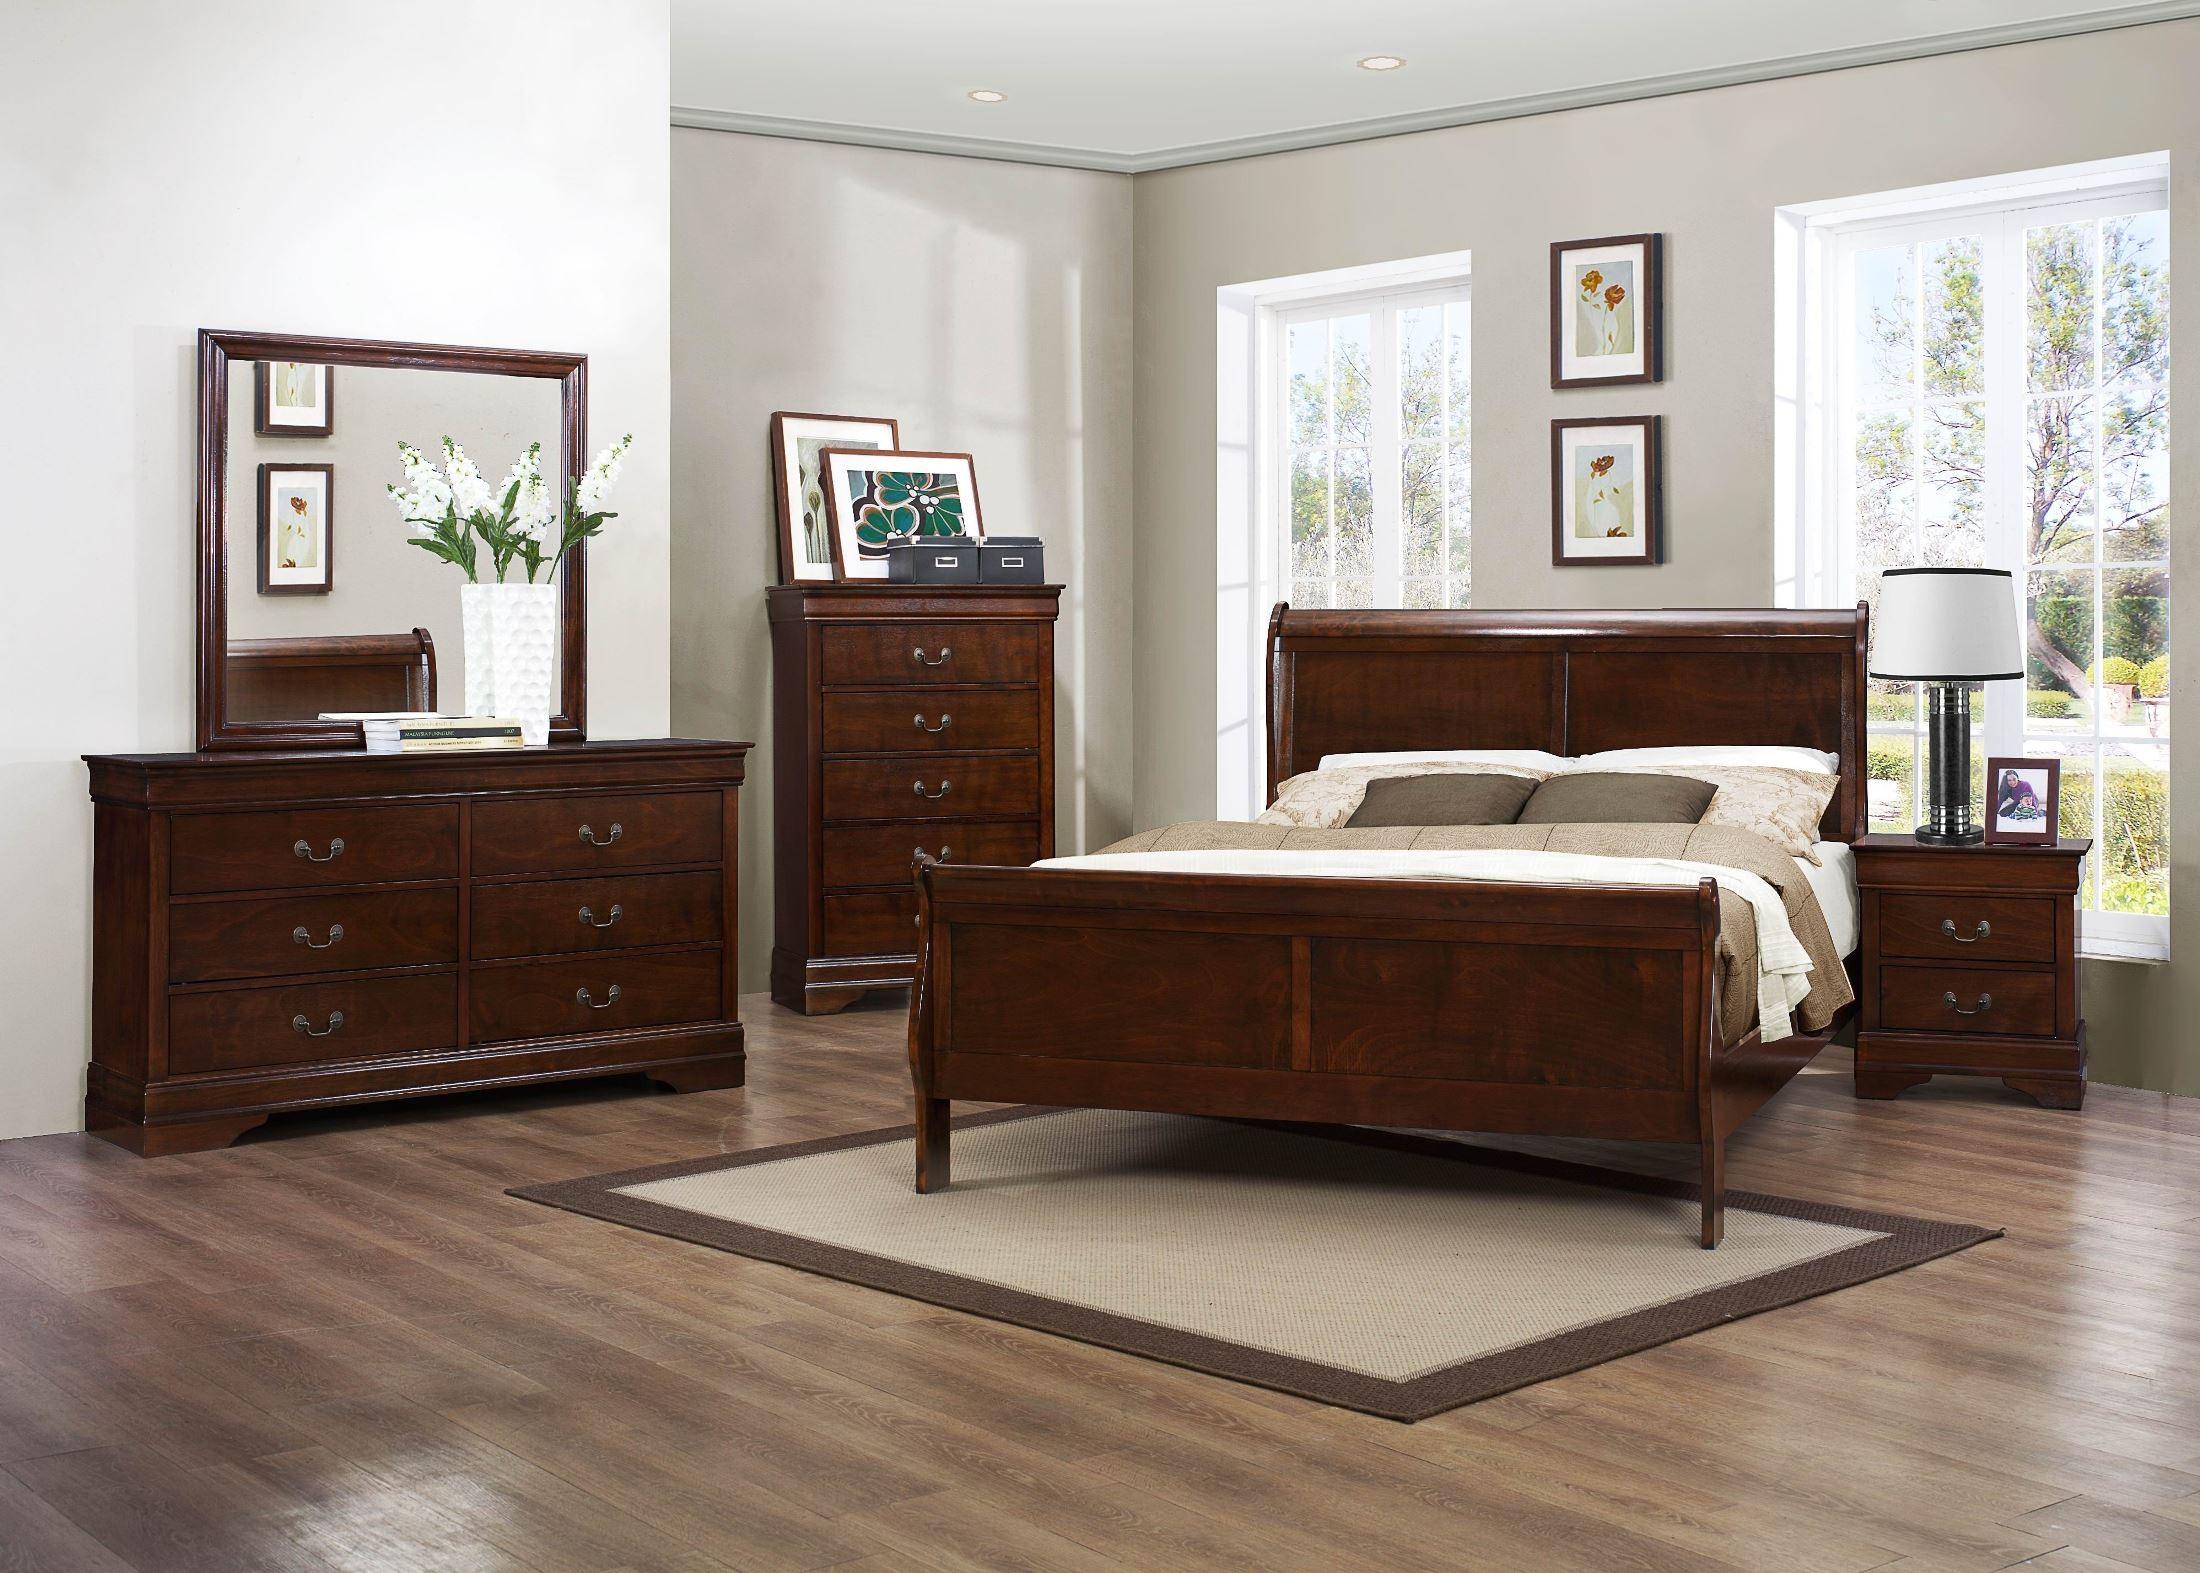 Charmant Coleman Furniture